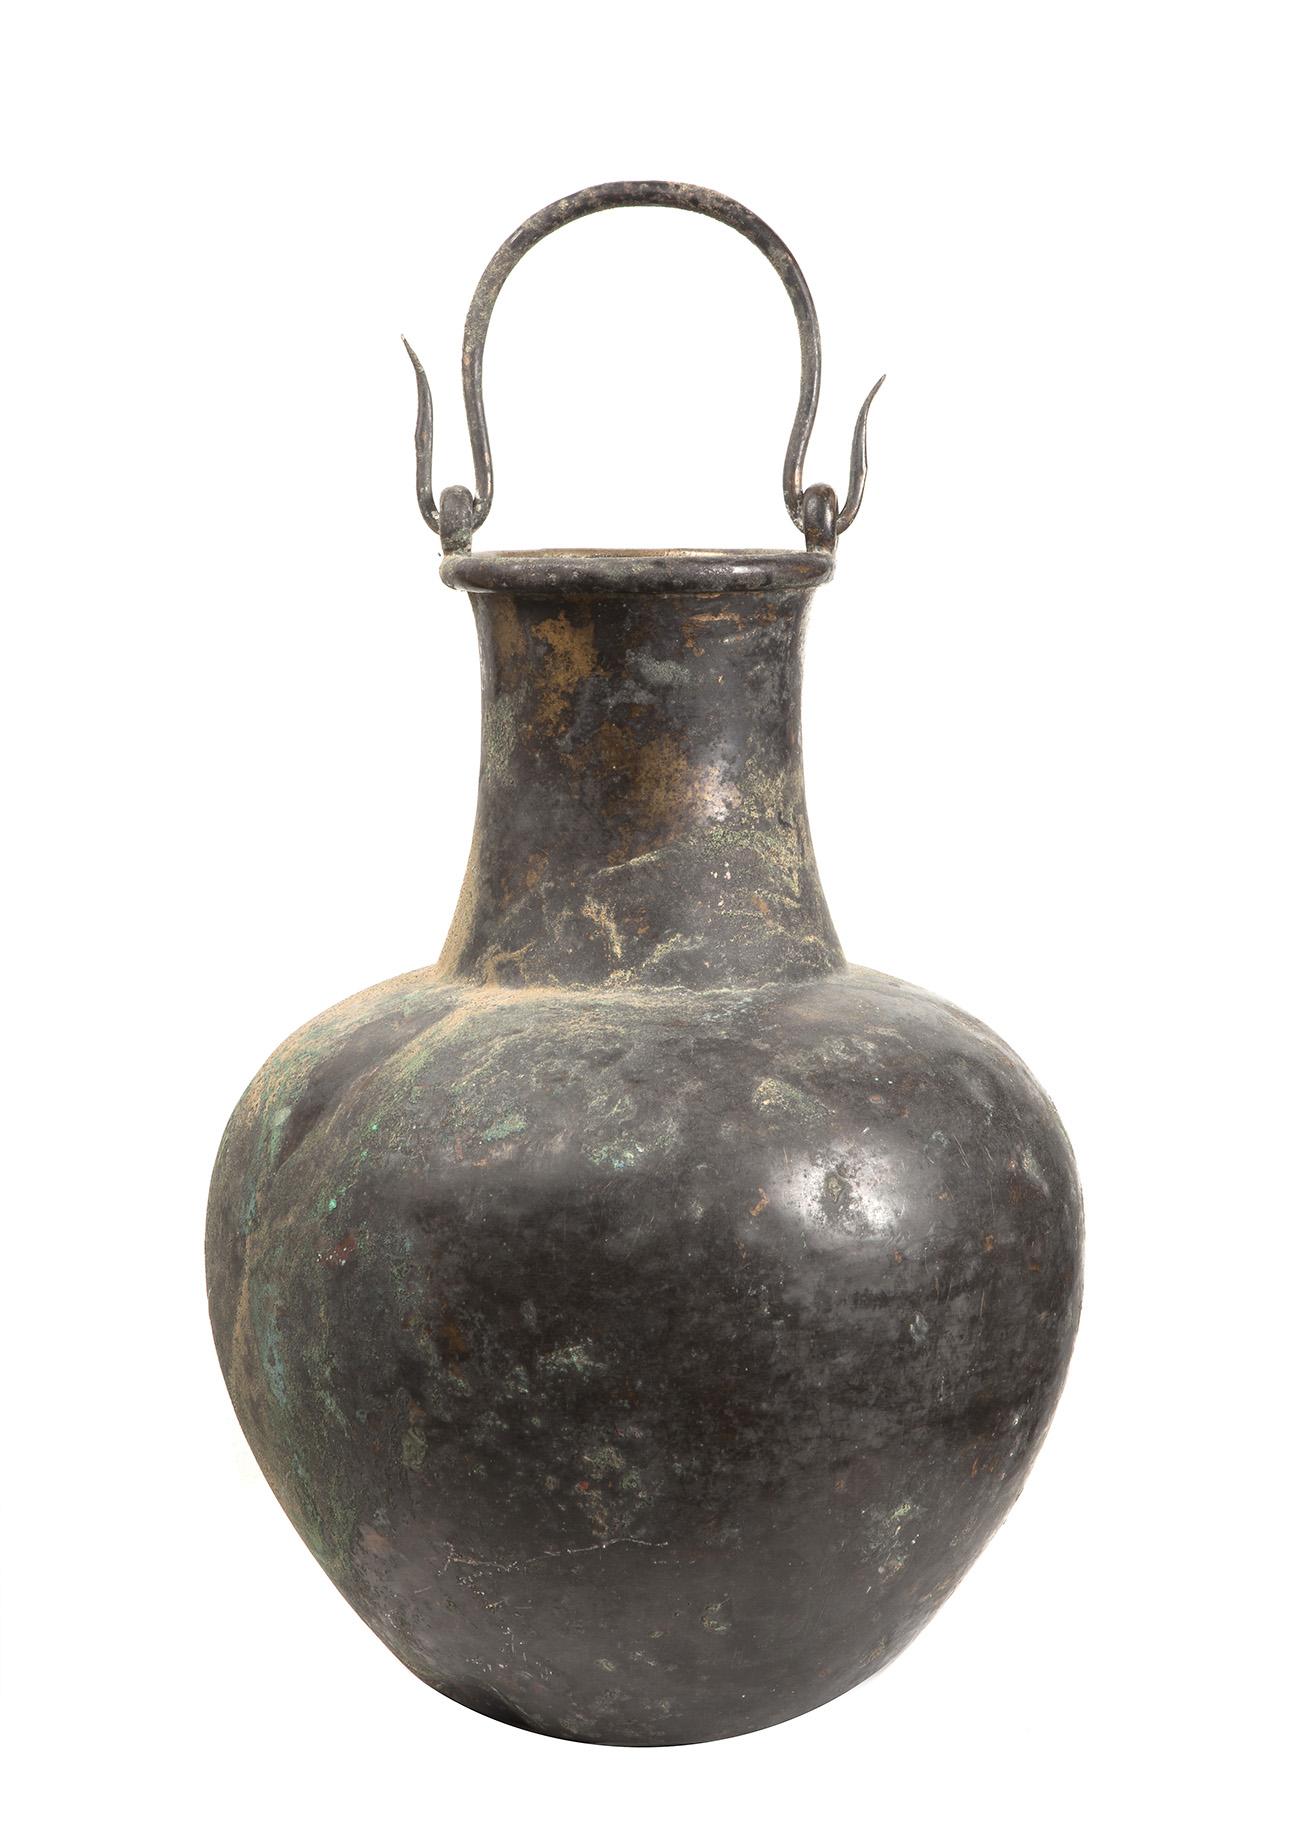 Sítula; Egipto, época ptolemaica, 323-30 a. C